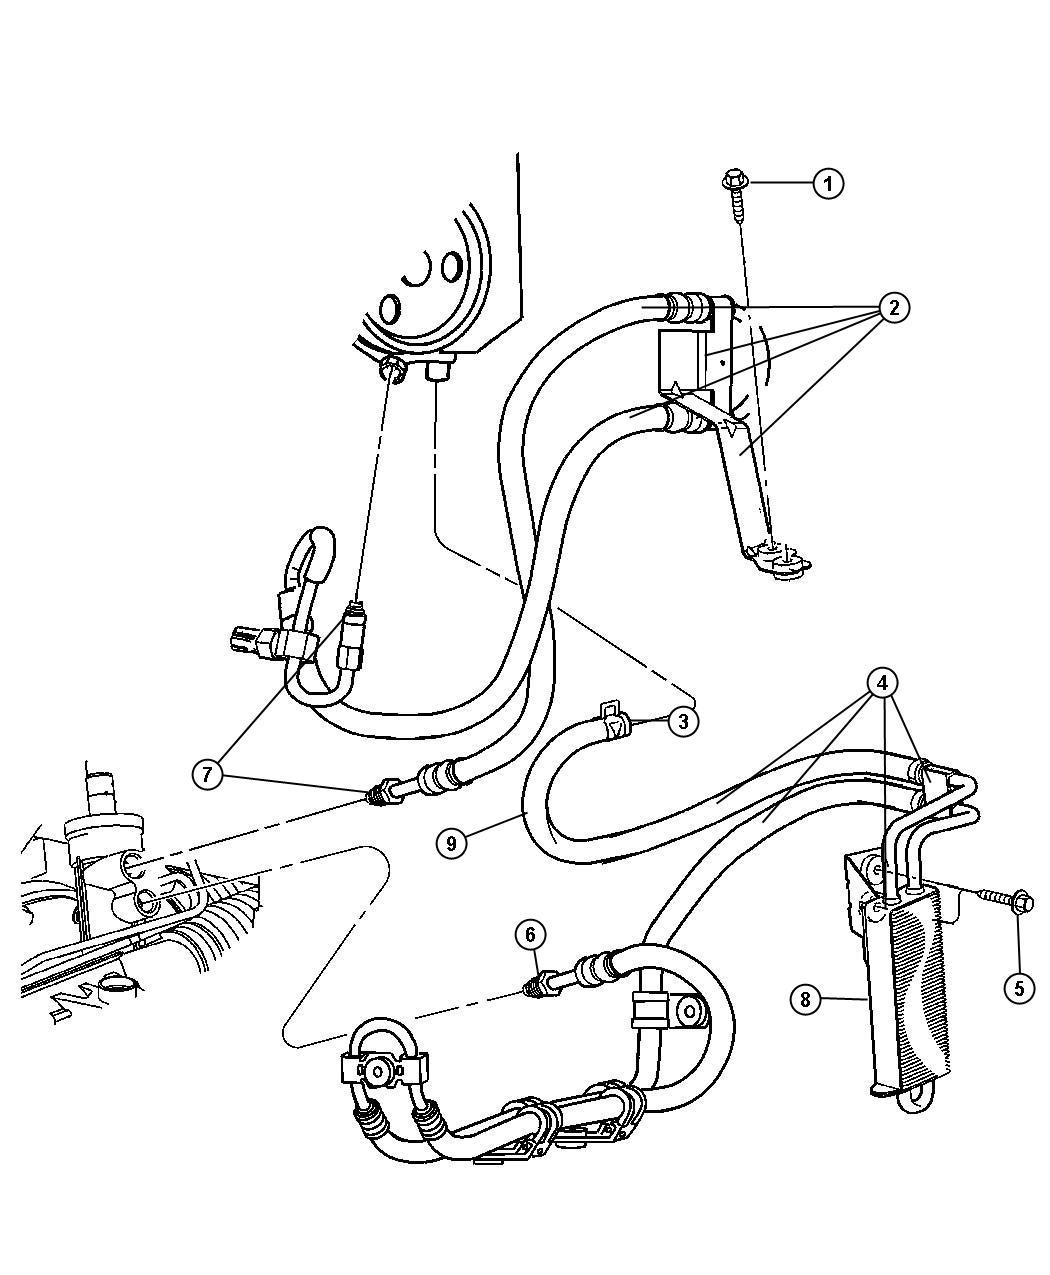 Dodge NITRO Cooler. Power steering. Hoses, suspension